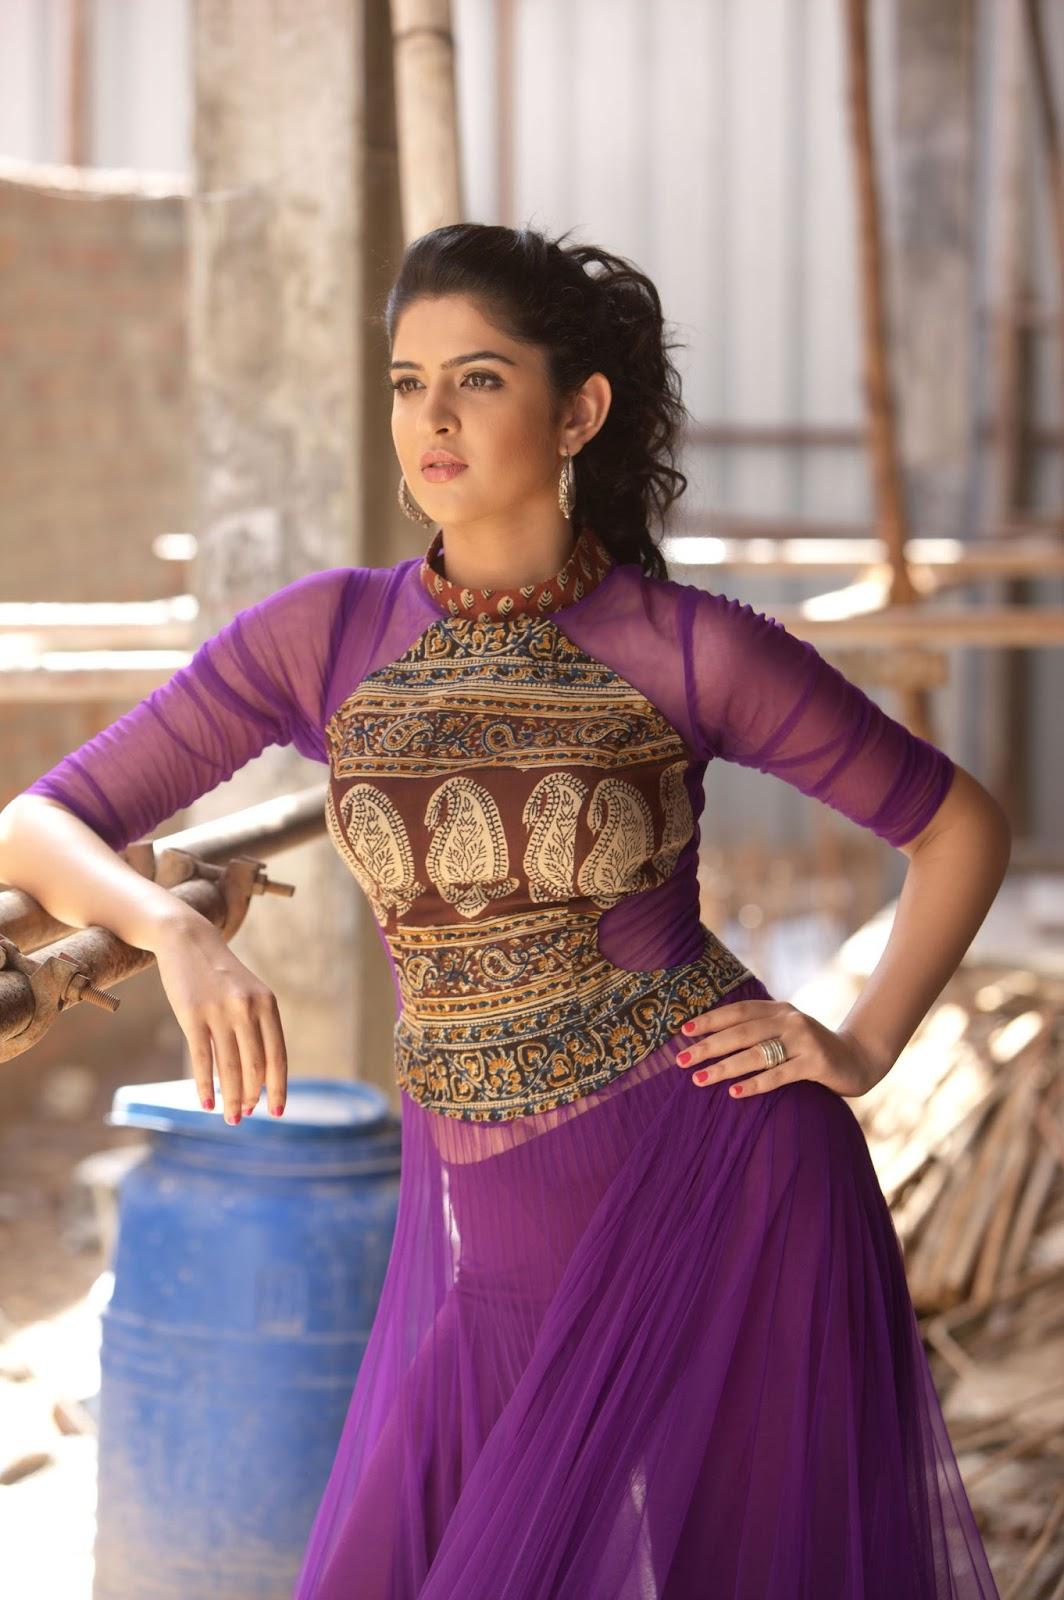 Tamil film 'Vettai Mannan' actress Deeksha Seth Ultra 4K Wallpapers